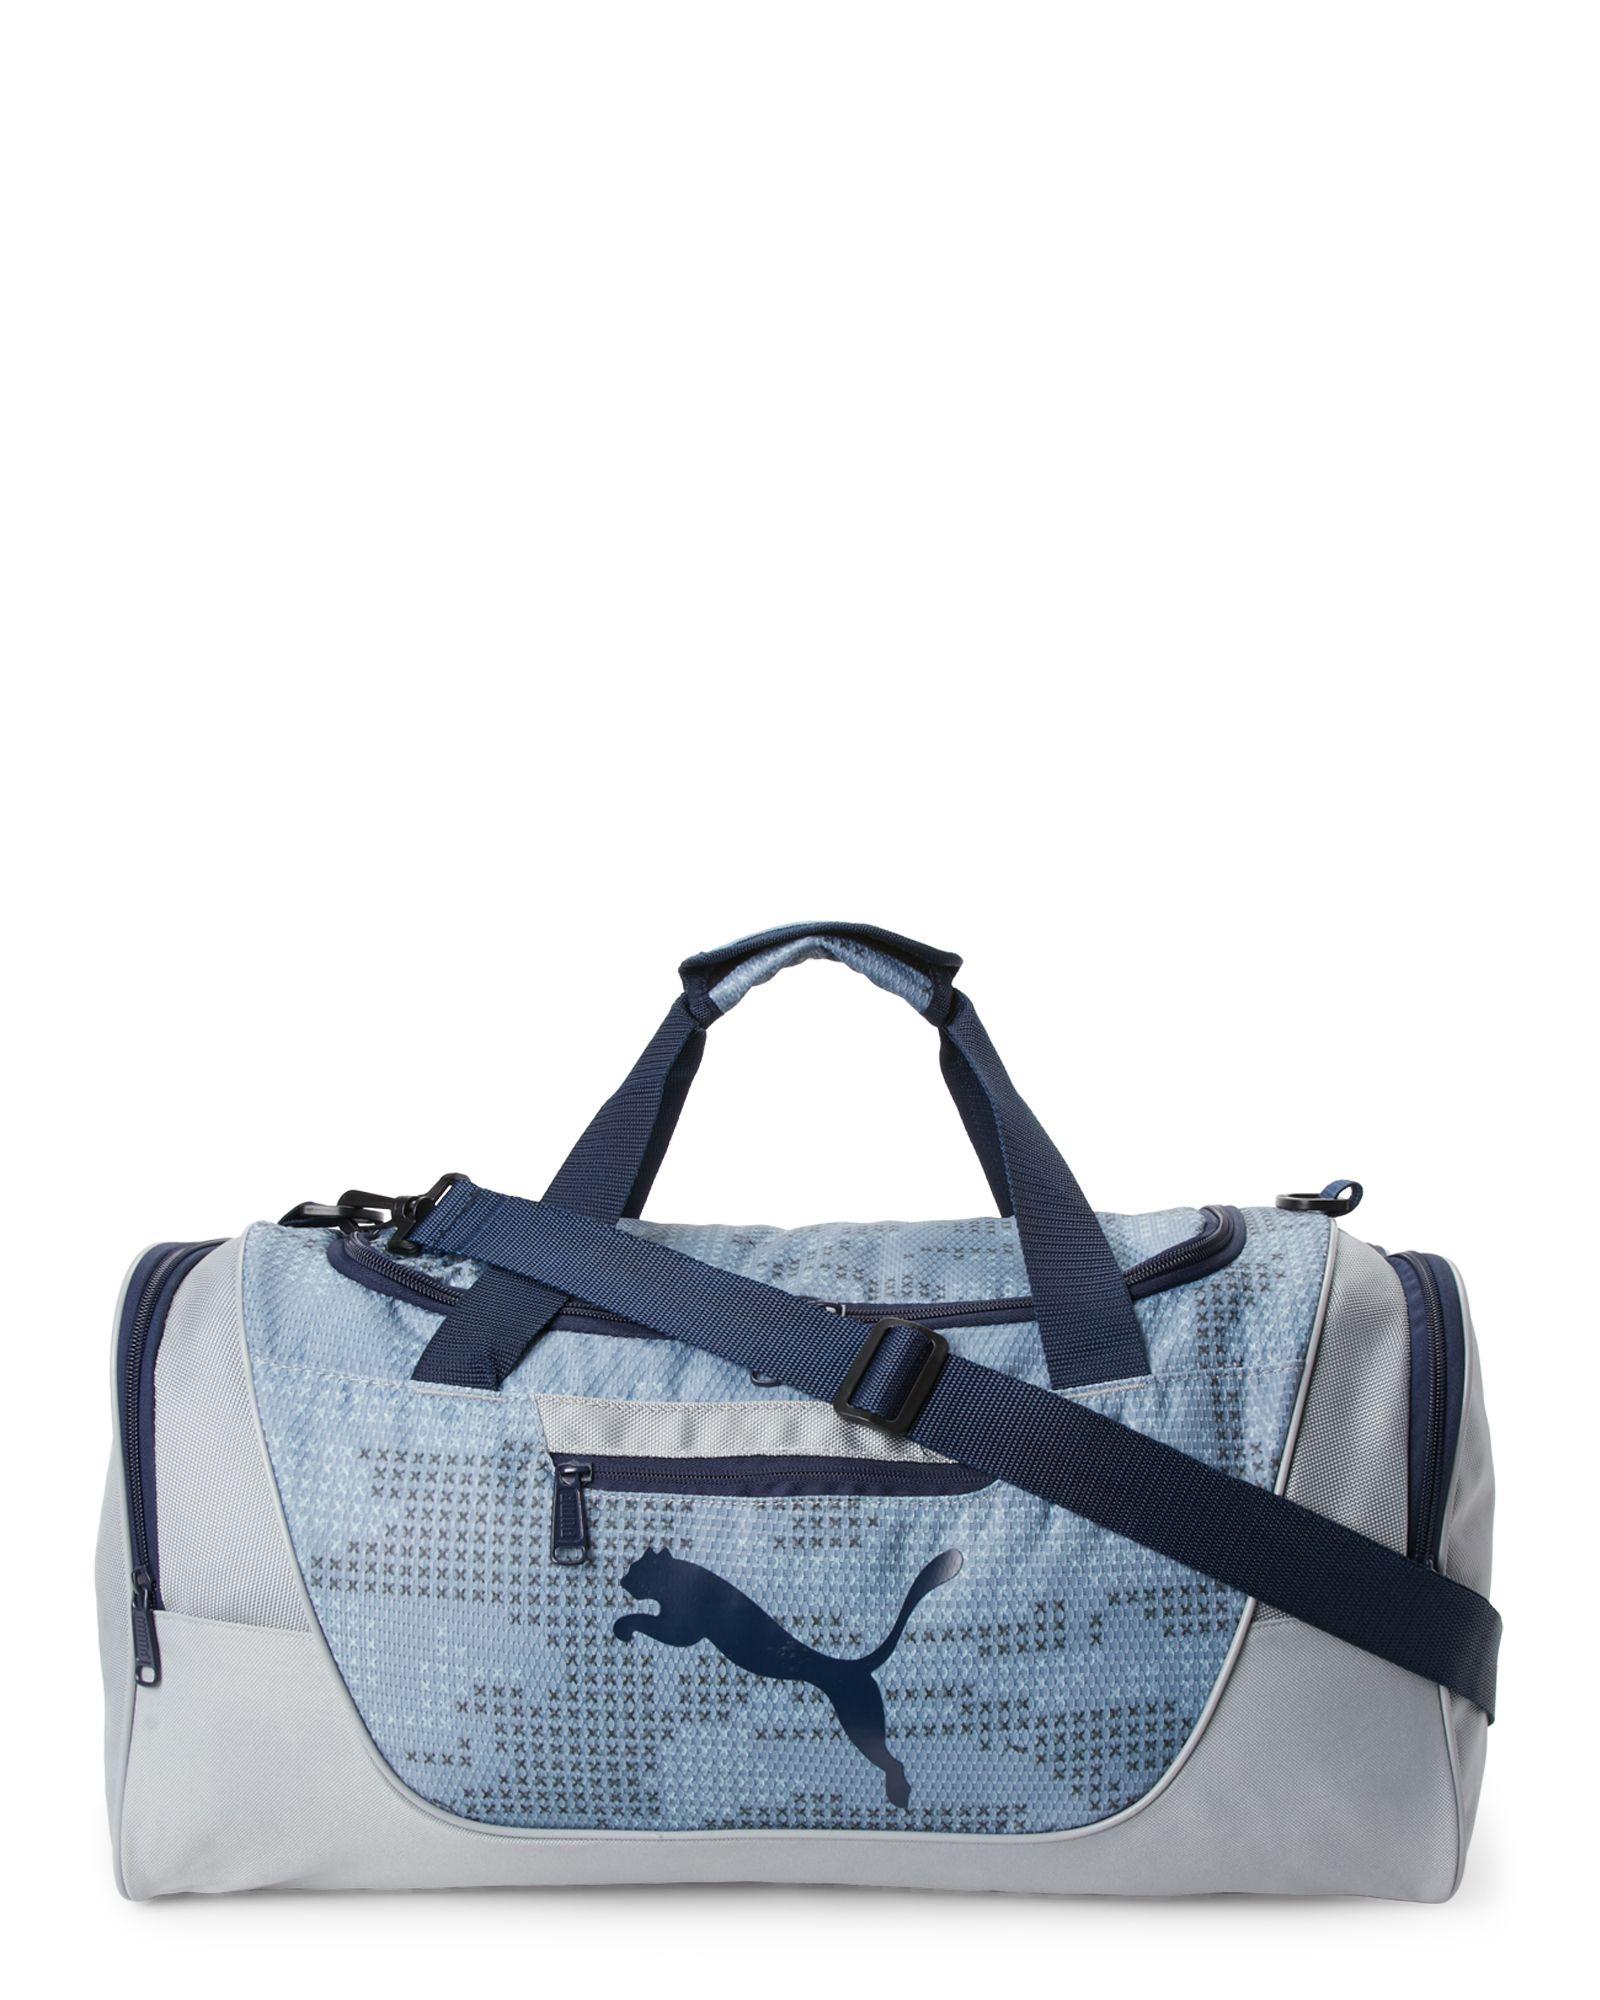 bba1ea94f Puma Grey Contender Duffle   *Luggage & Bags*   Bags, Luggage bags ...